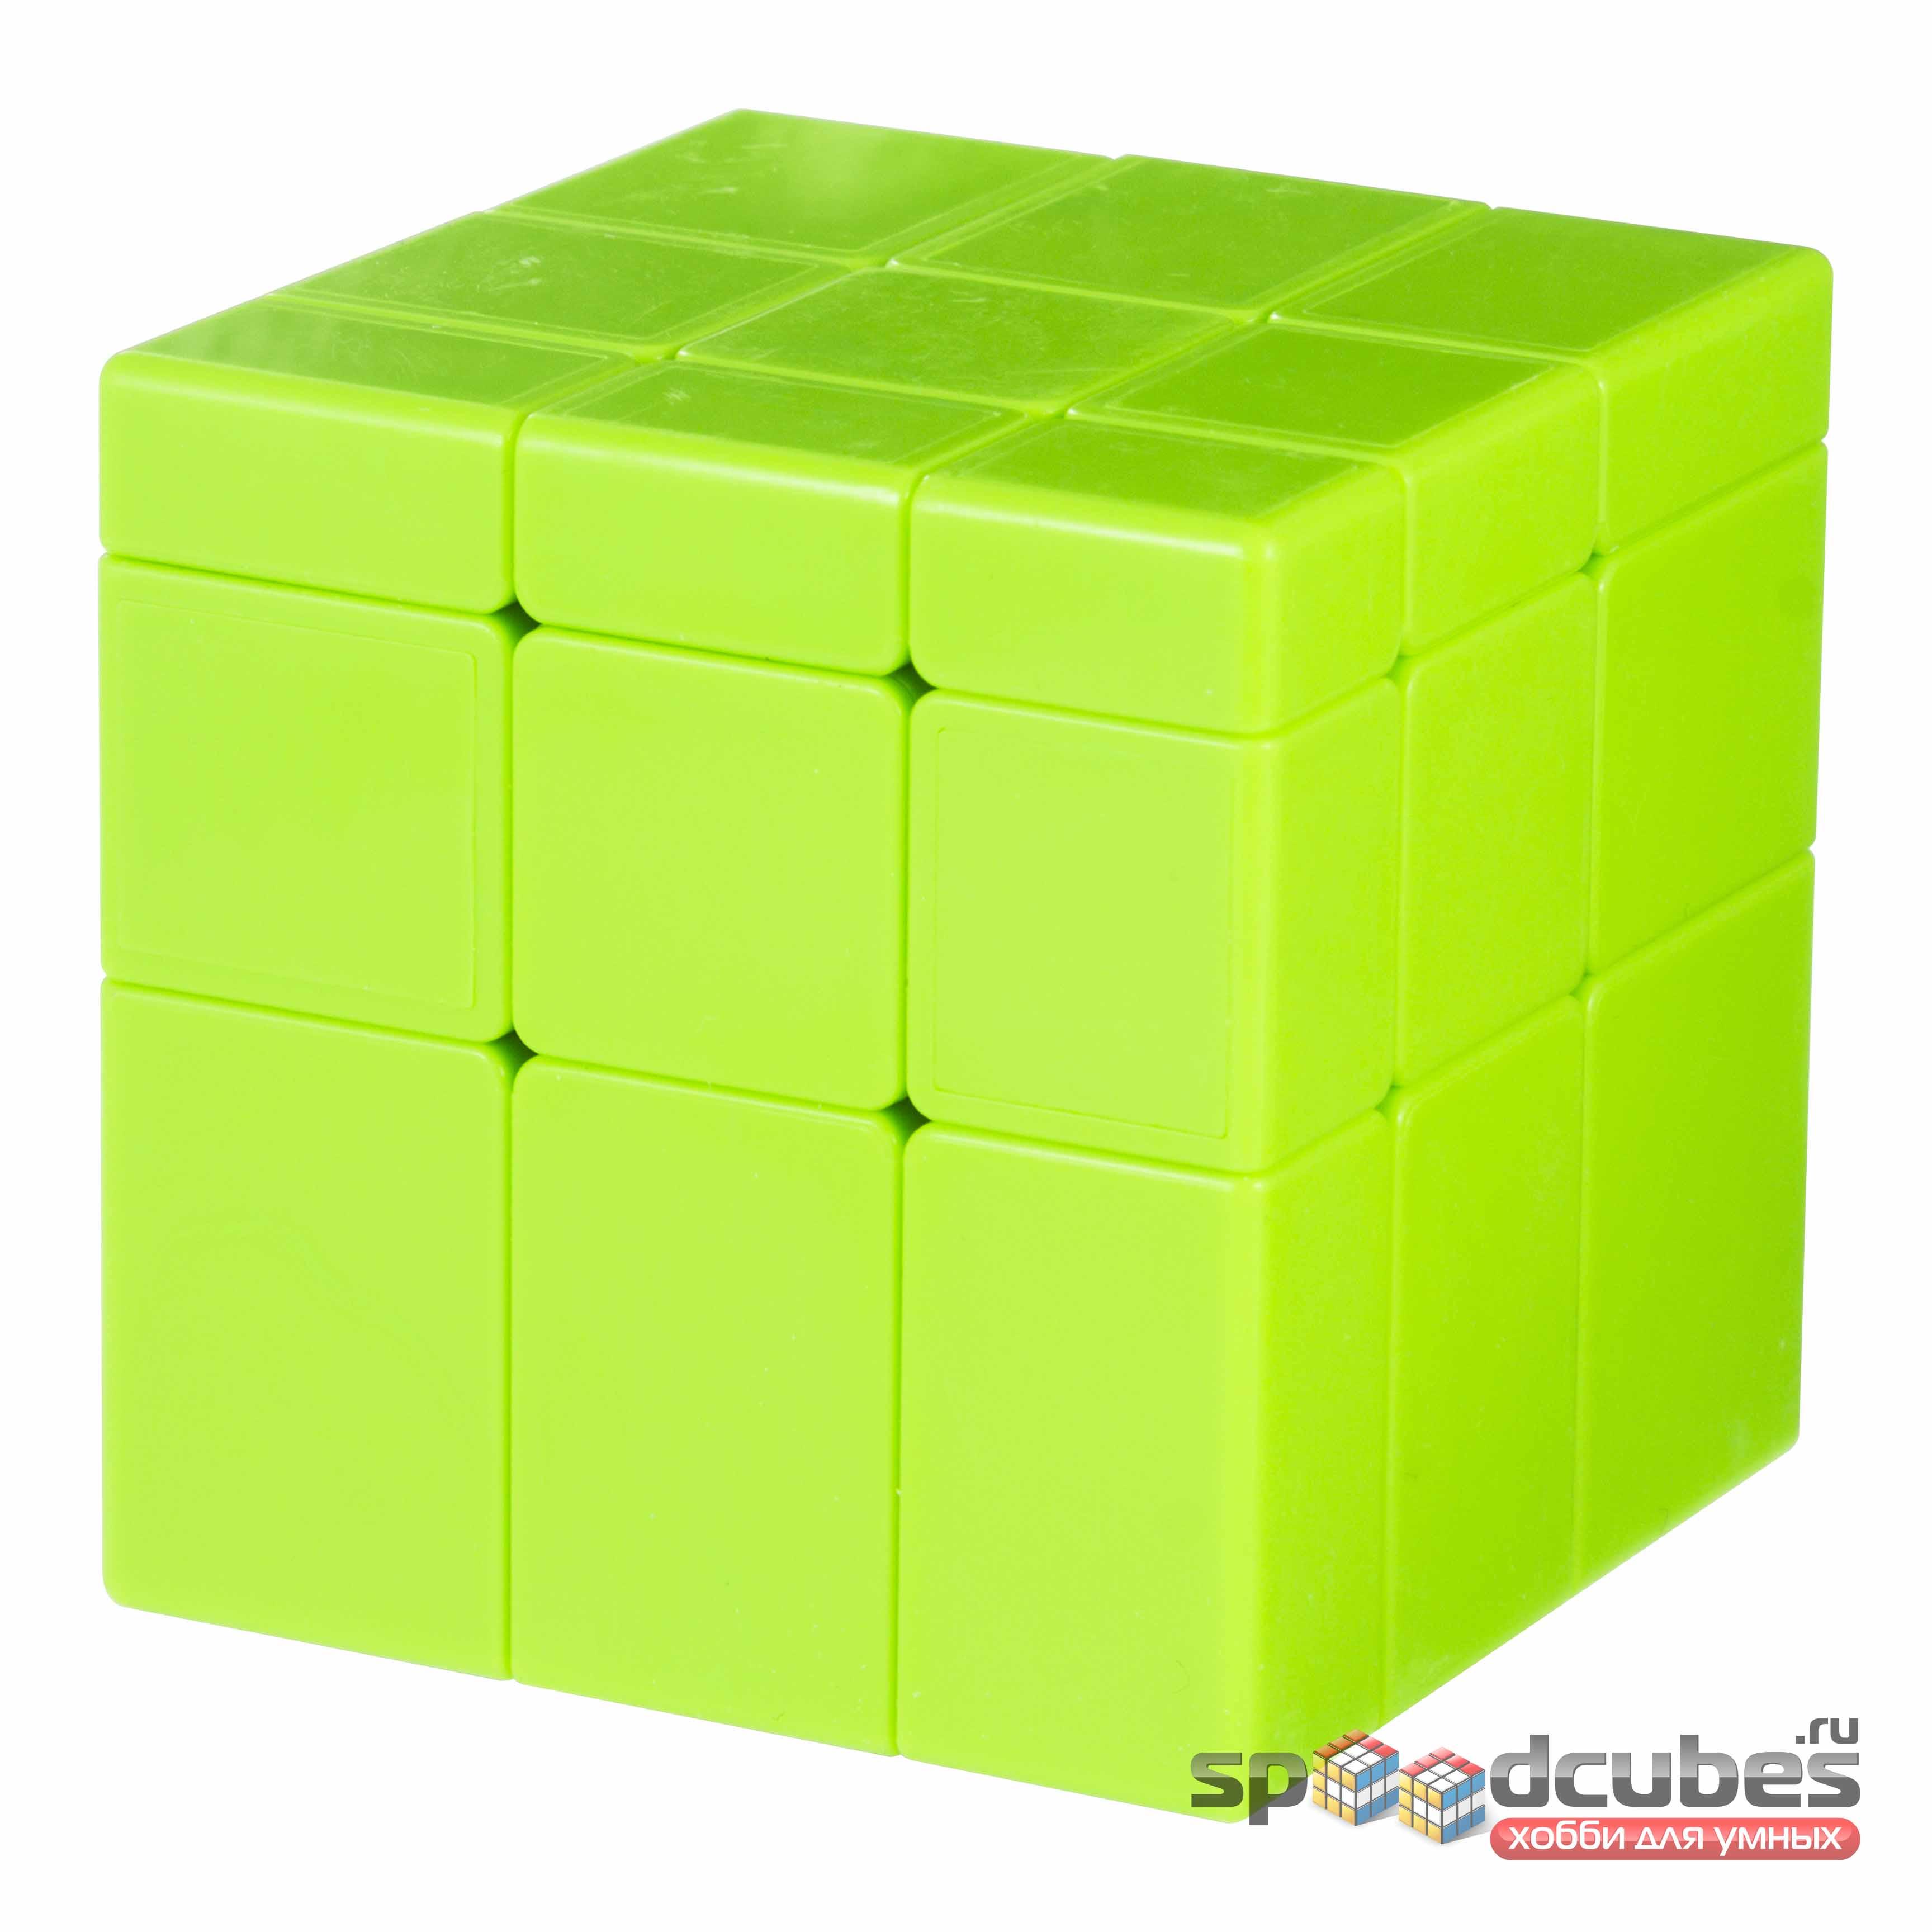 QiYi (MoFangGe) 3×3 Green Mirror Cube 2